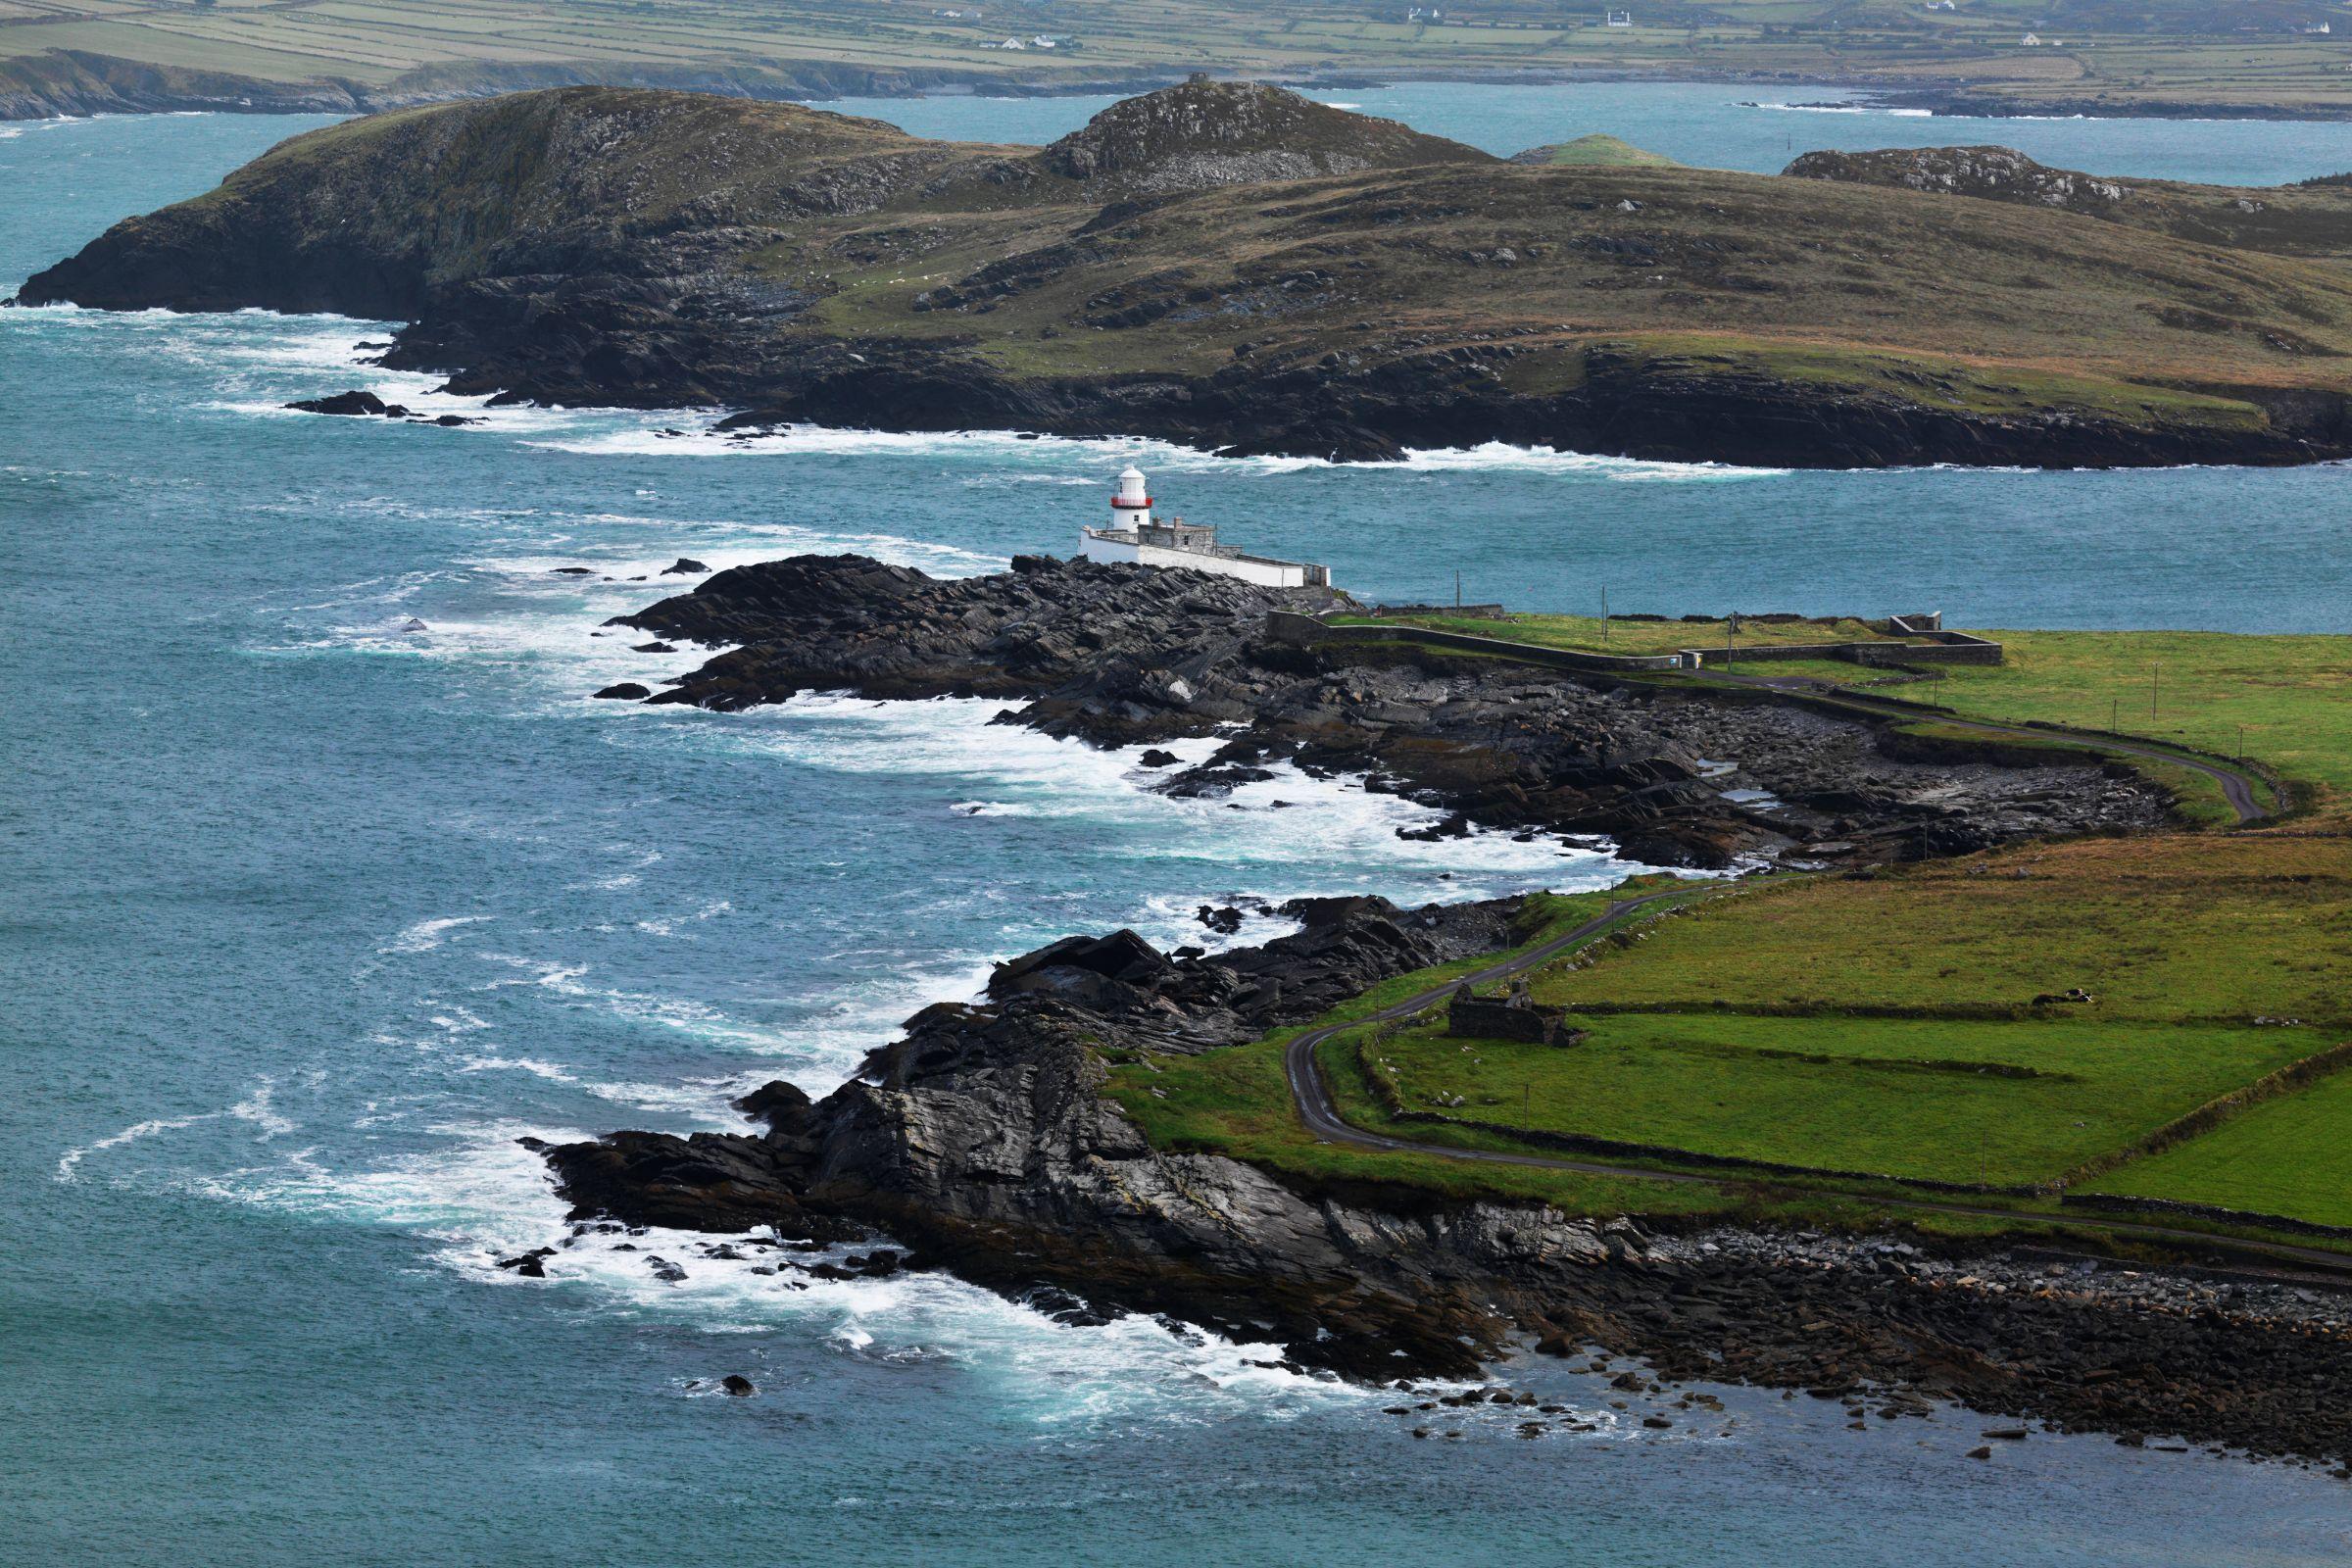 Visit Valentia Island with Discover Ireland